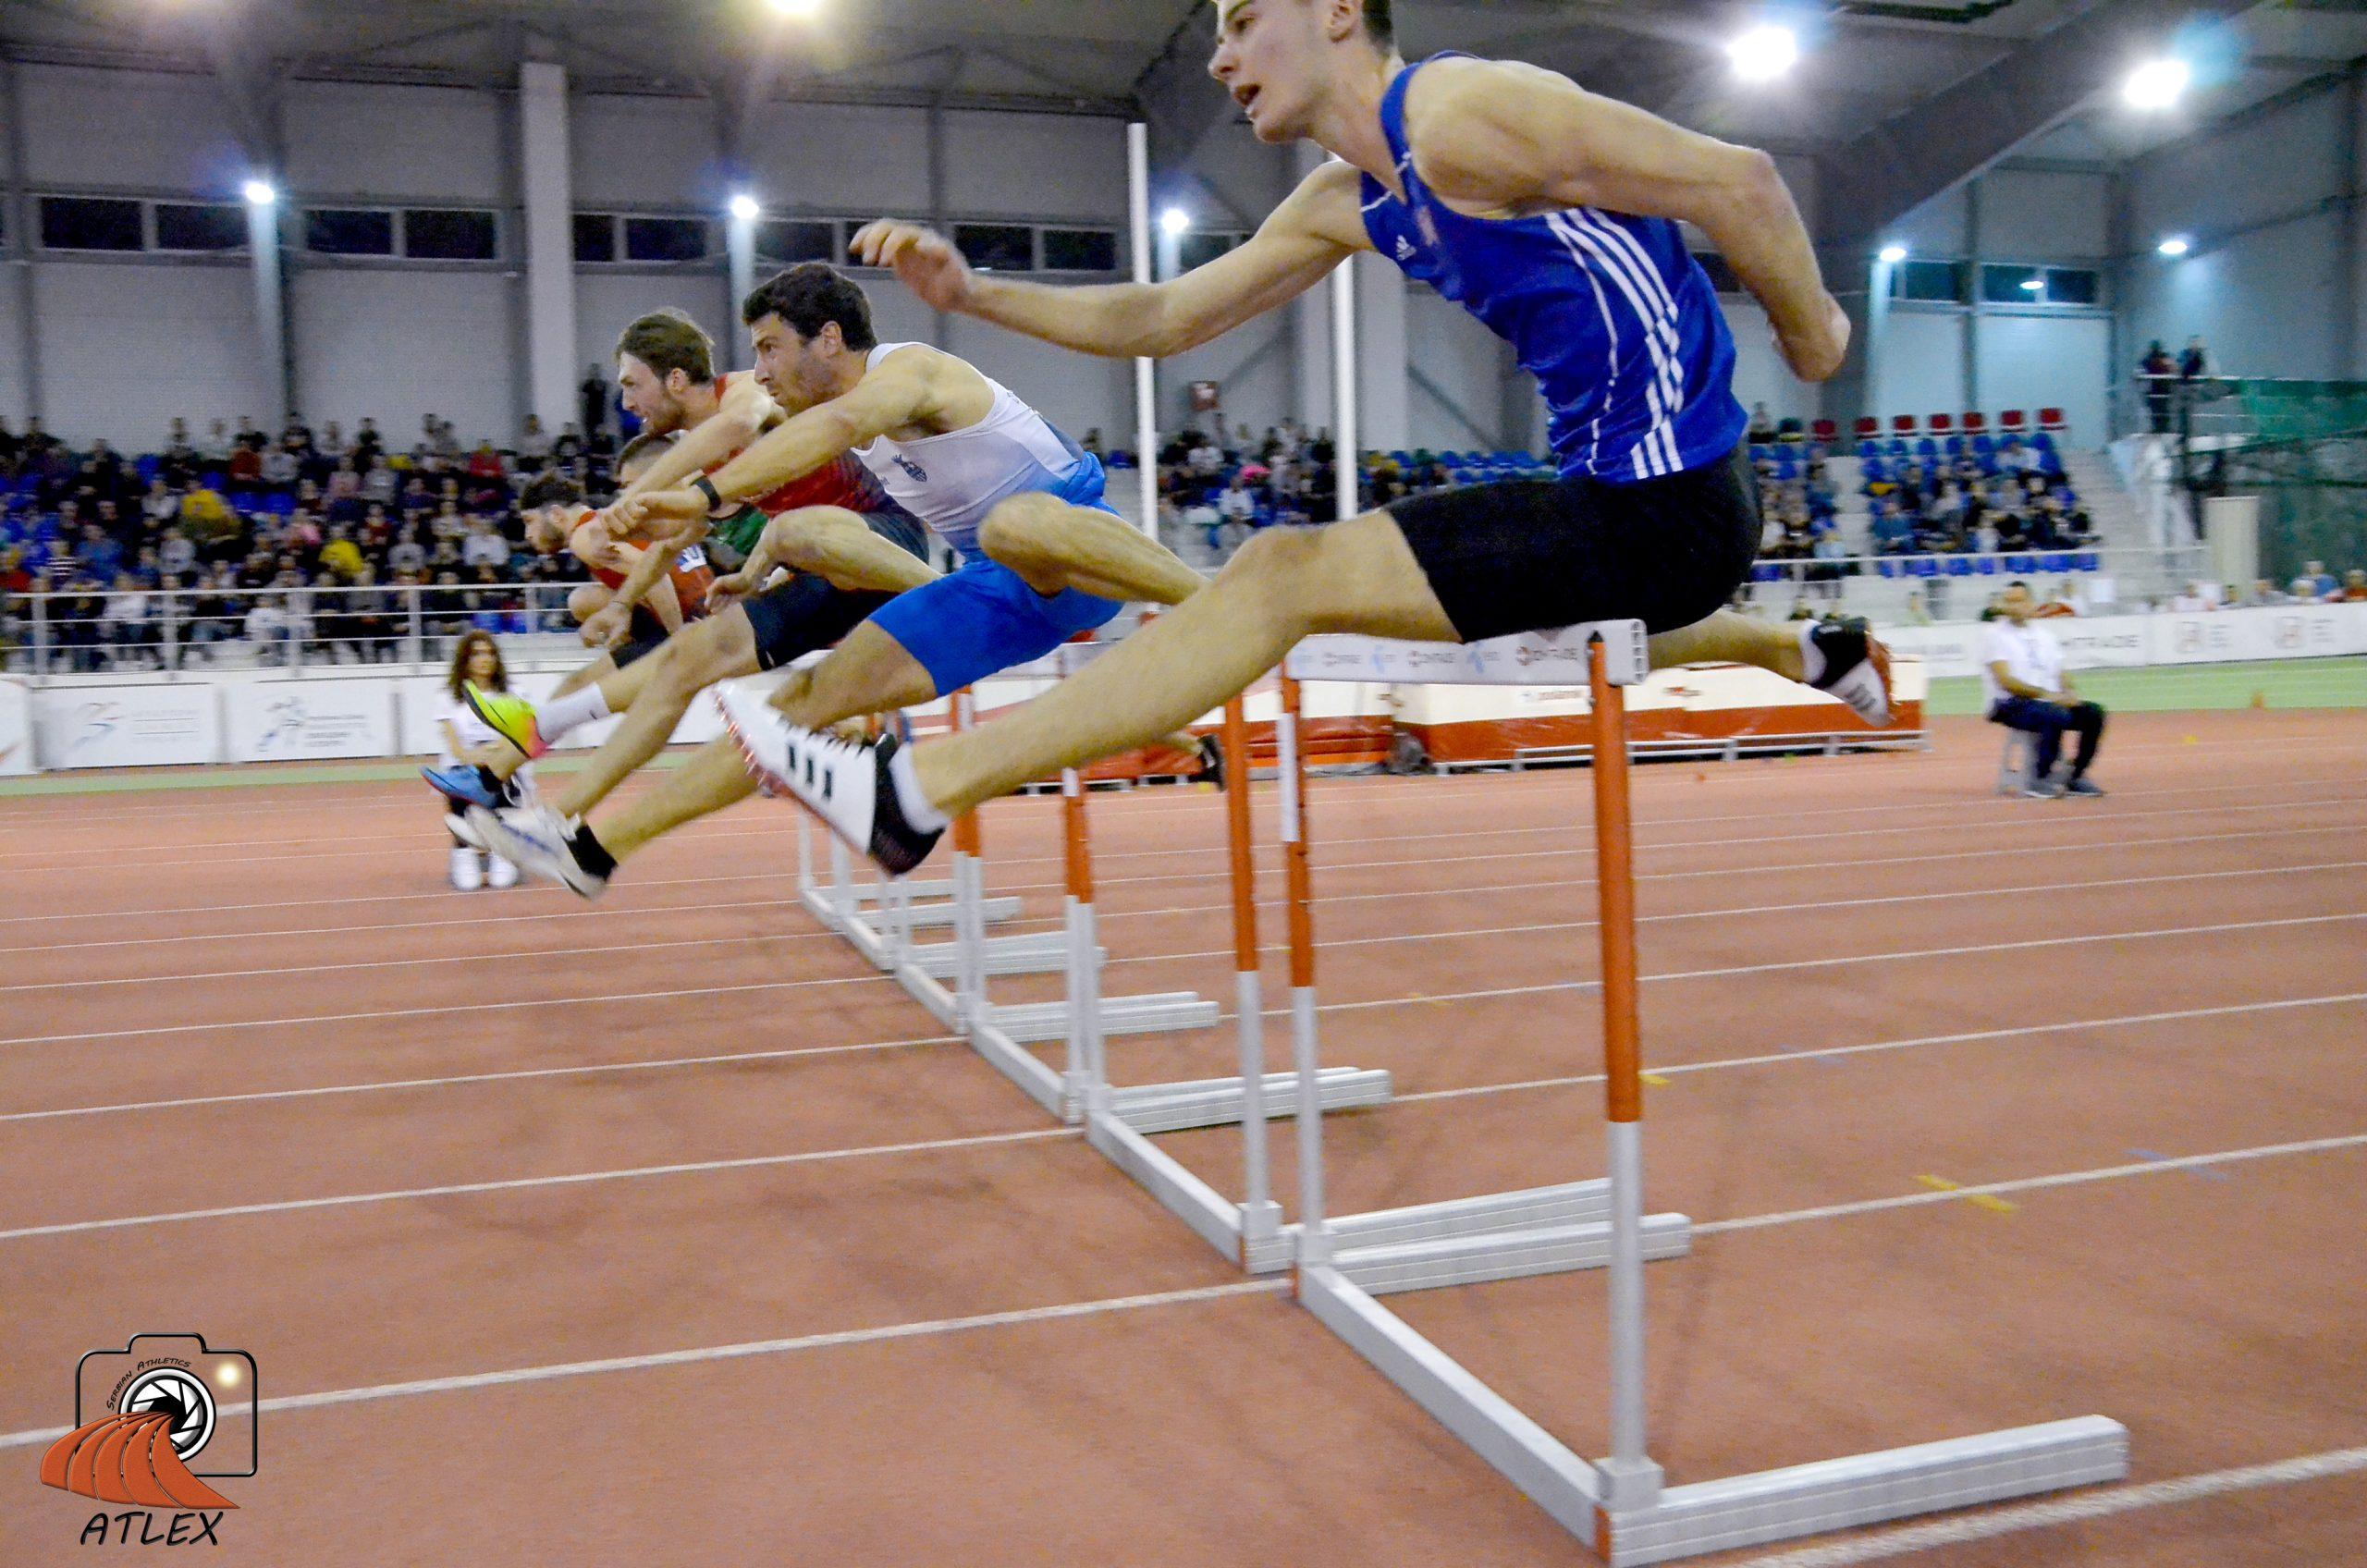 Luka Trgovcevic, Liam Van der Šaf, 60 metara prepone, Serbian open 2020